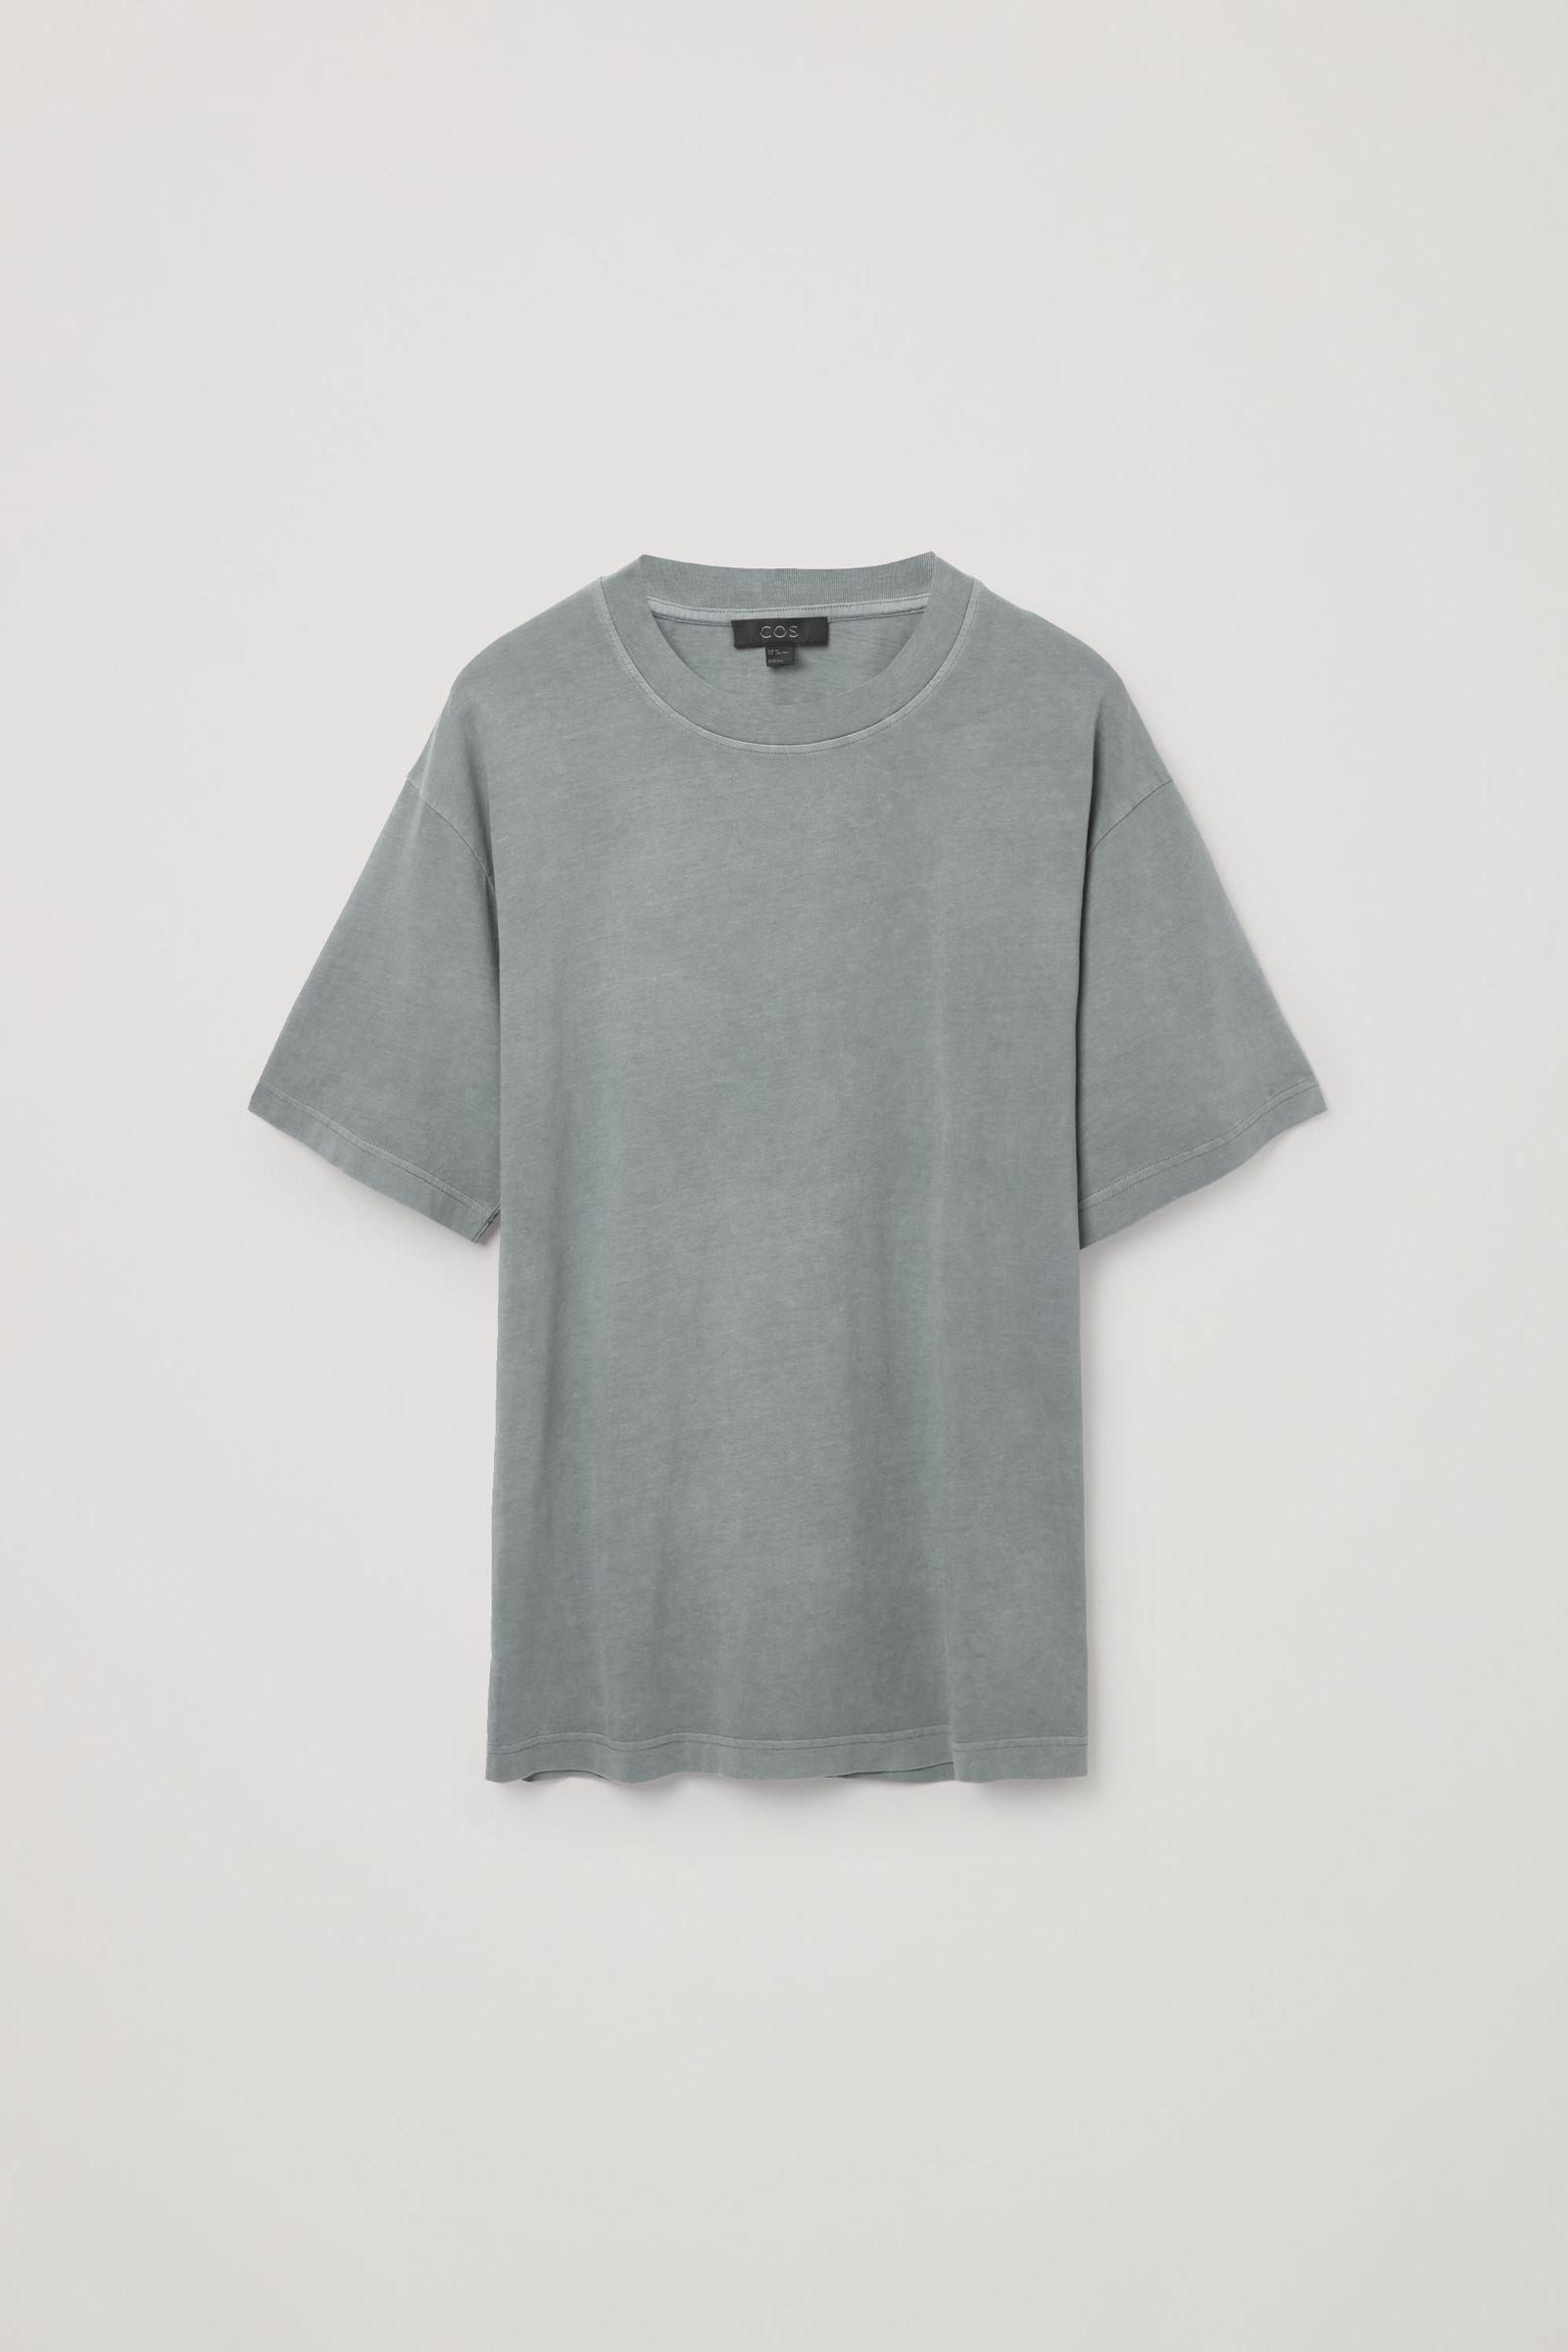 COS 오버사이즈 핏 티셔츠의 블루컬러 Product입니다.